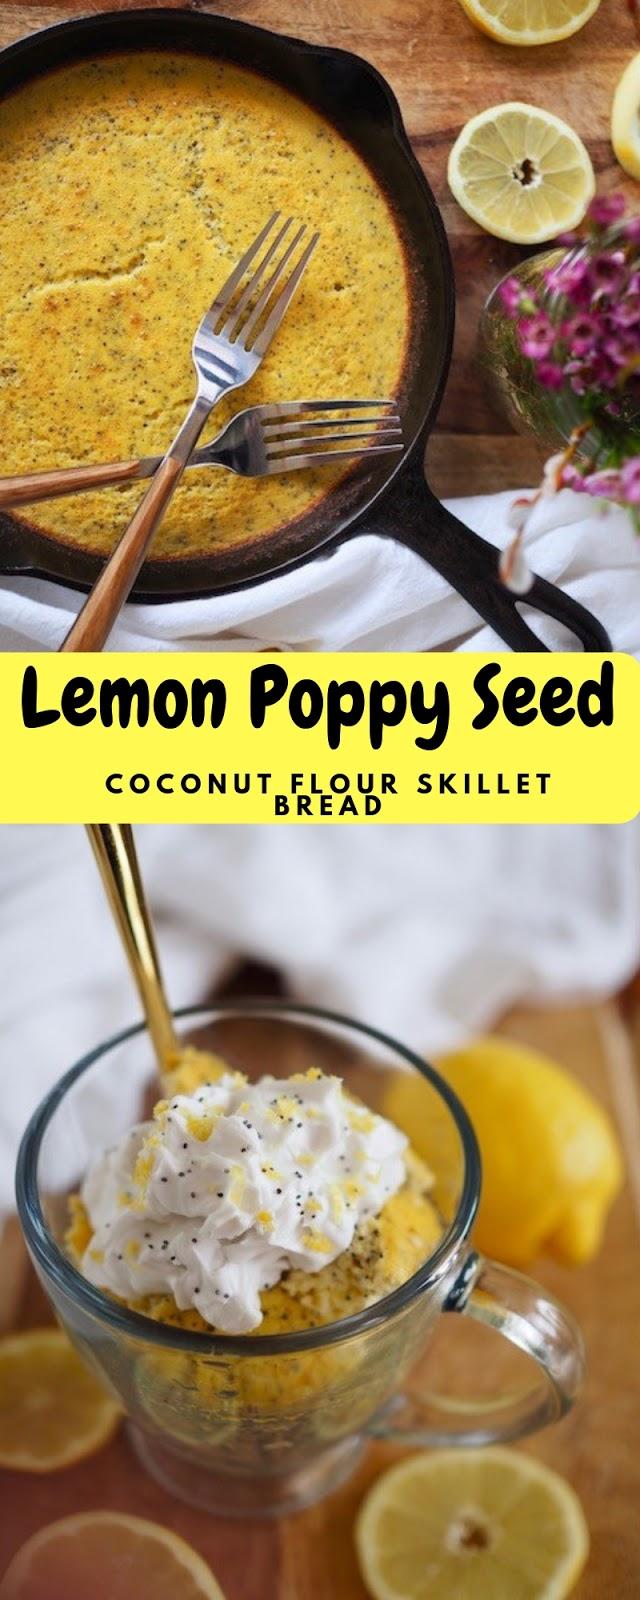 Lemon Poppy Seed Coconut Flour Skillet Bread